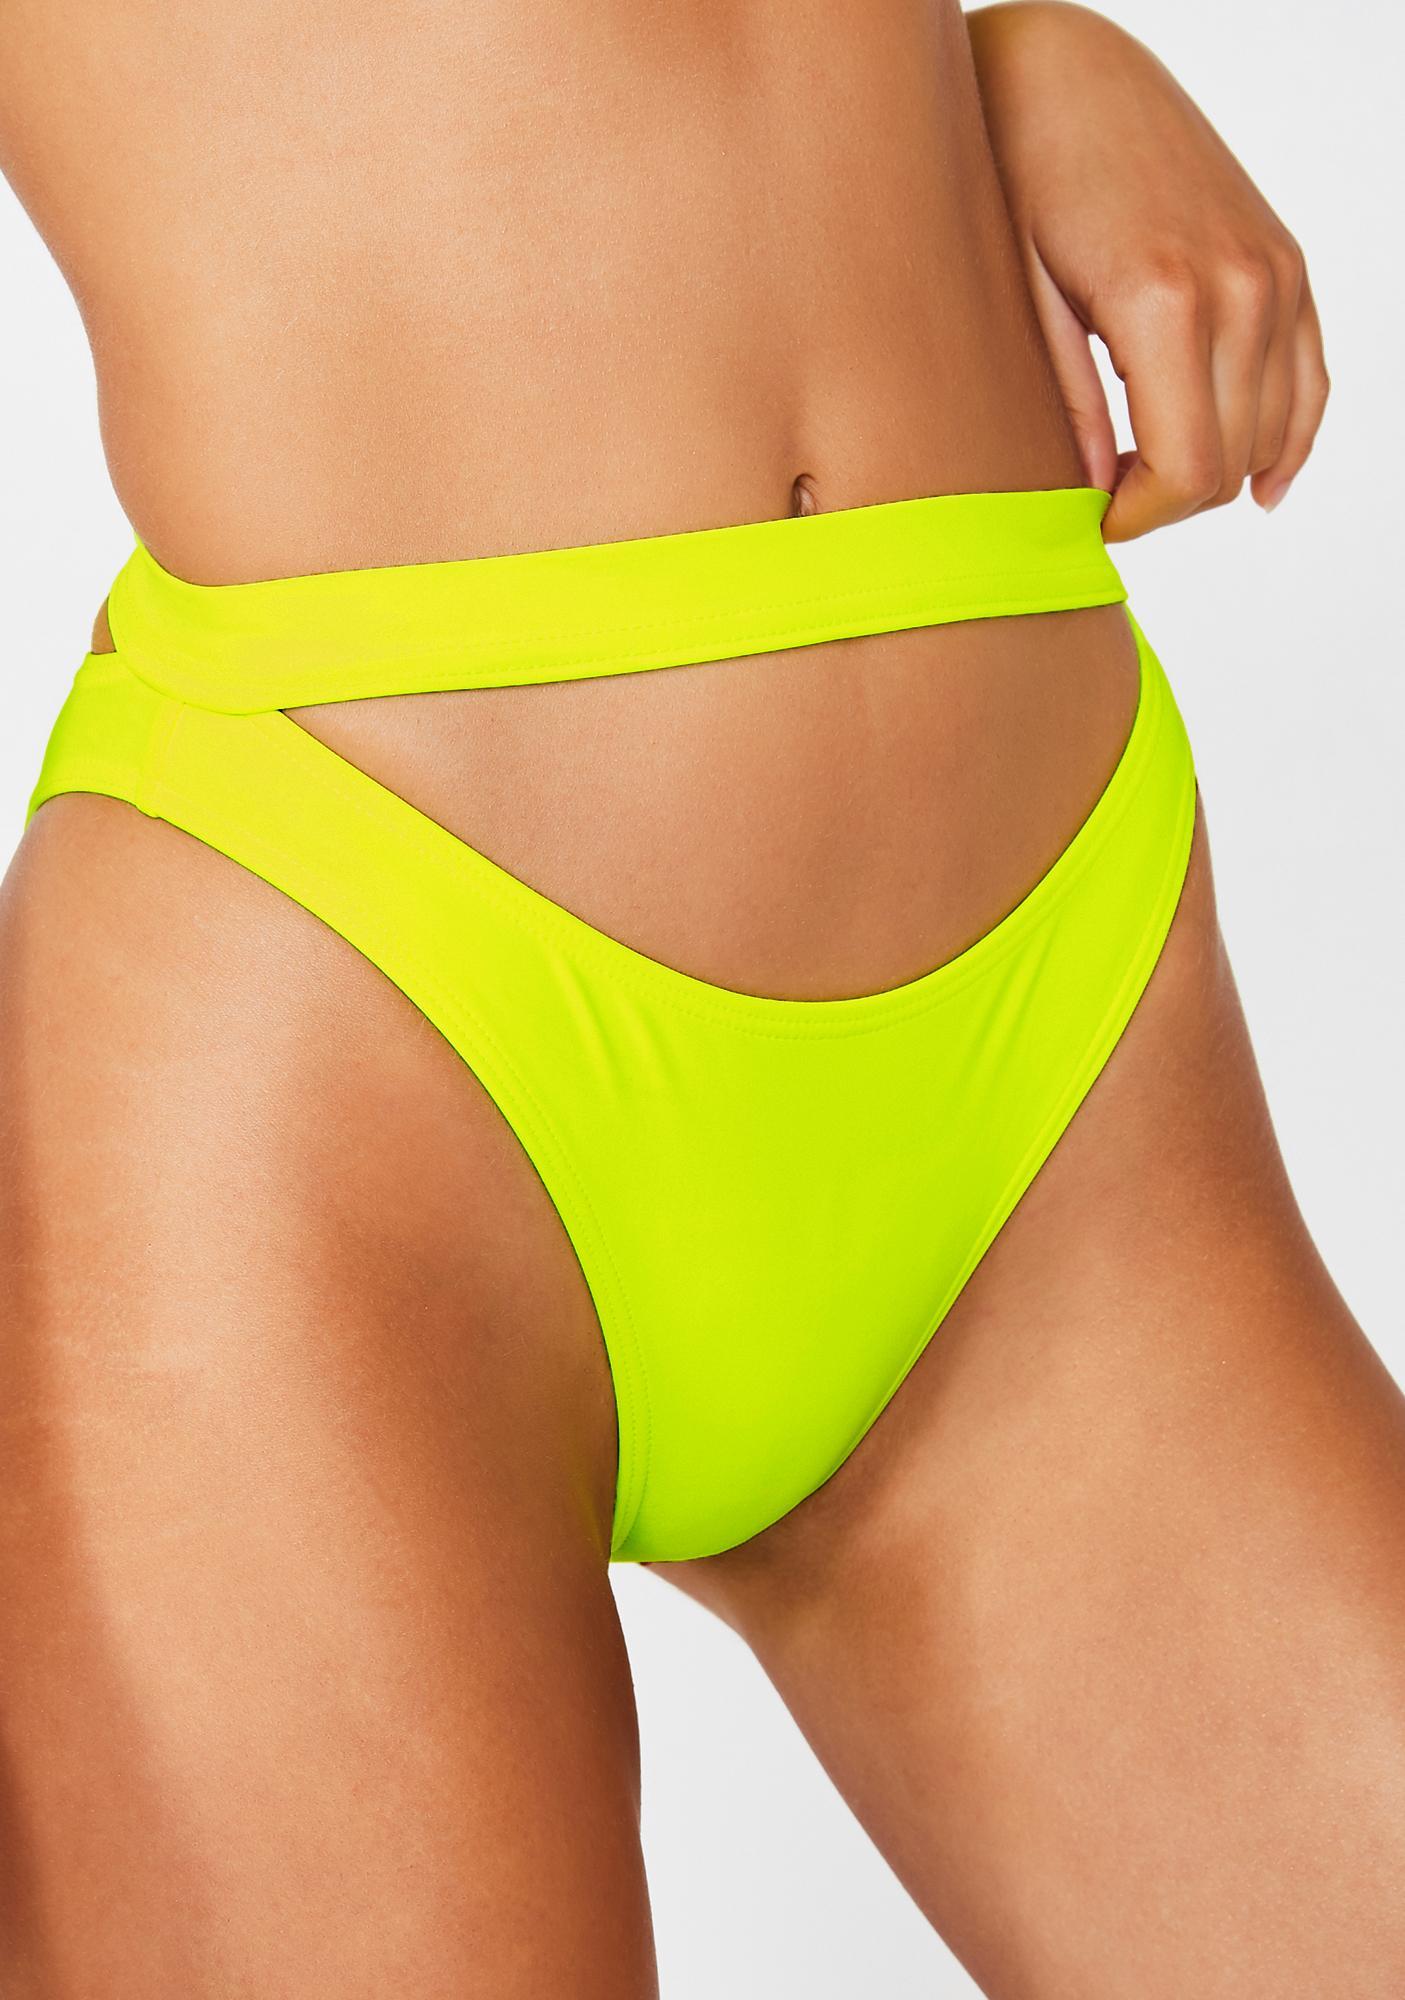 Current Mood Nuclear Bliss Bikini Bottoms